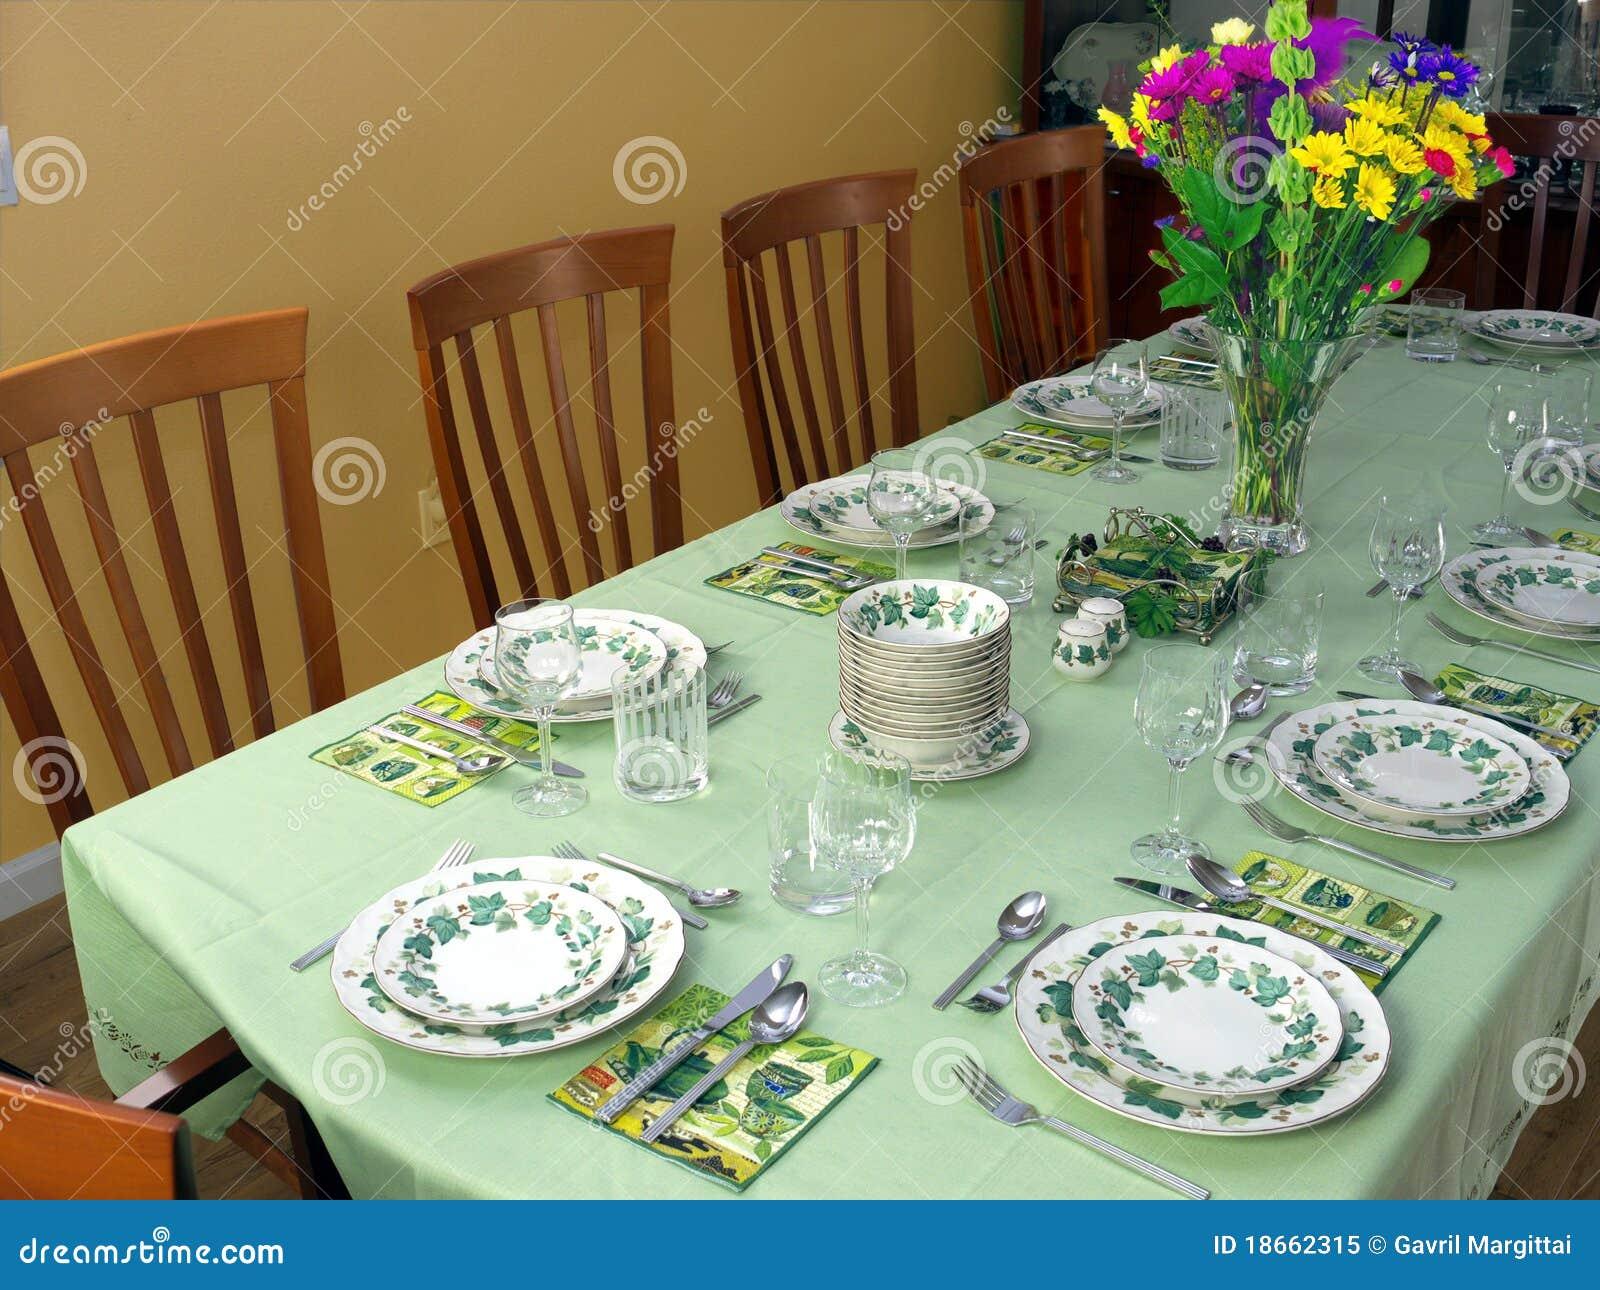 Large Table Set For Fancy Dinner